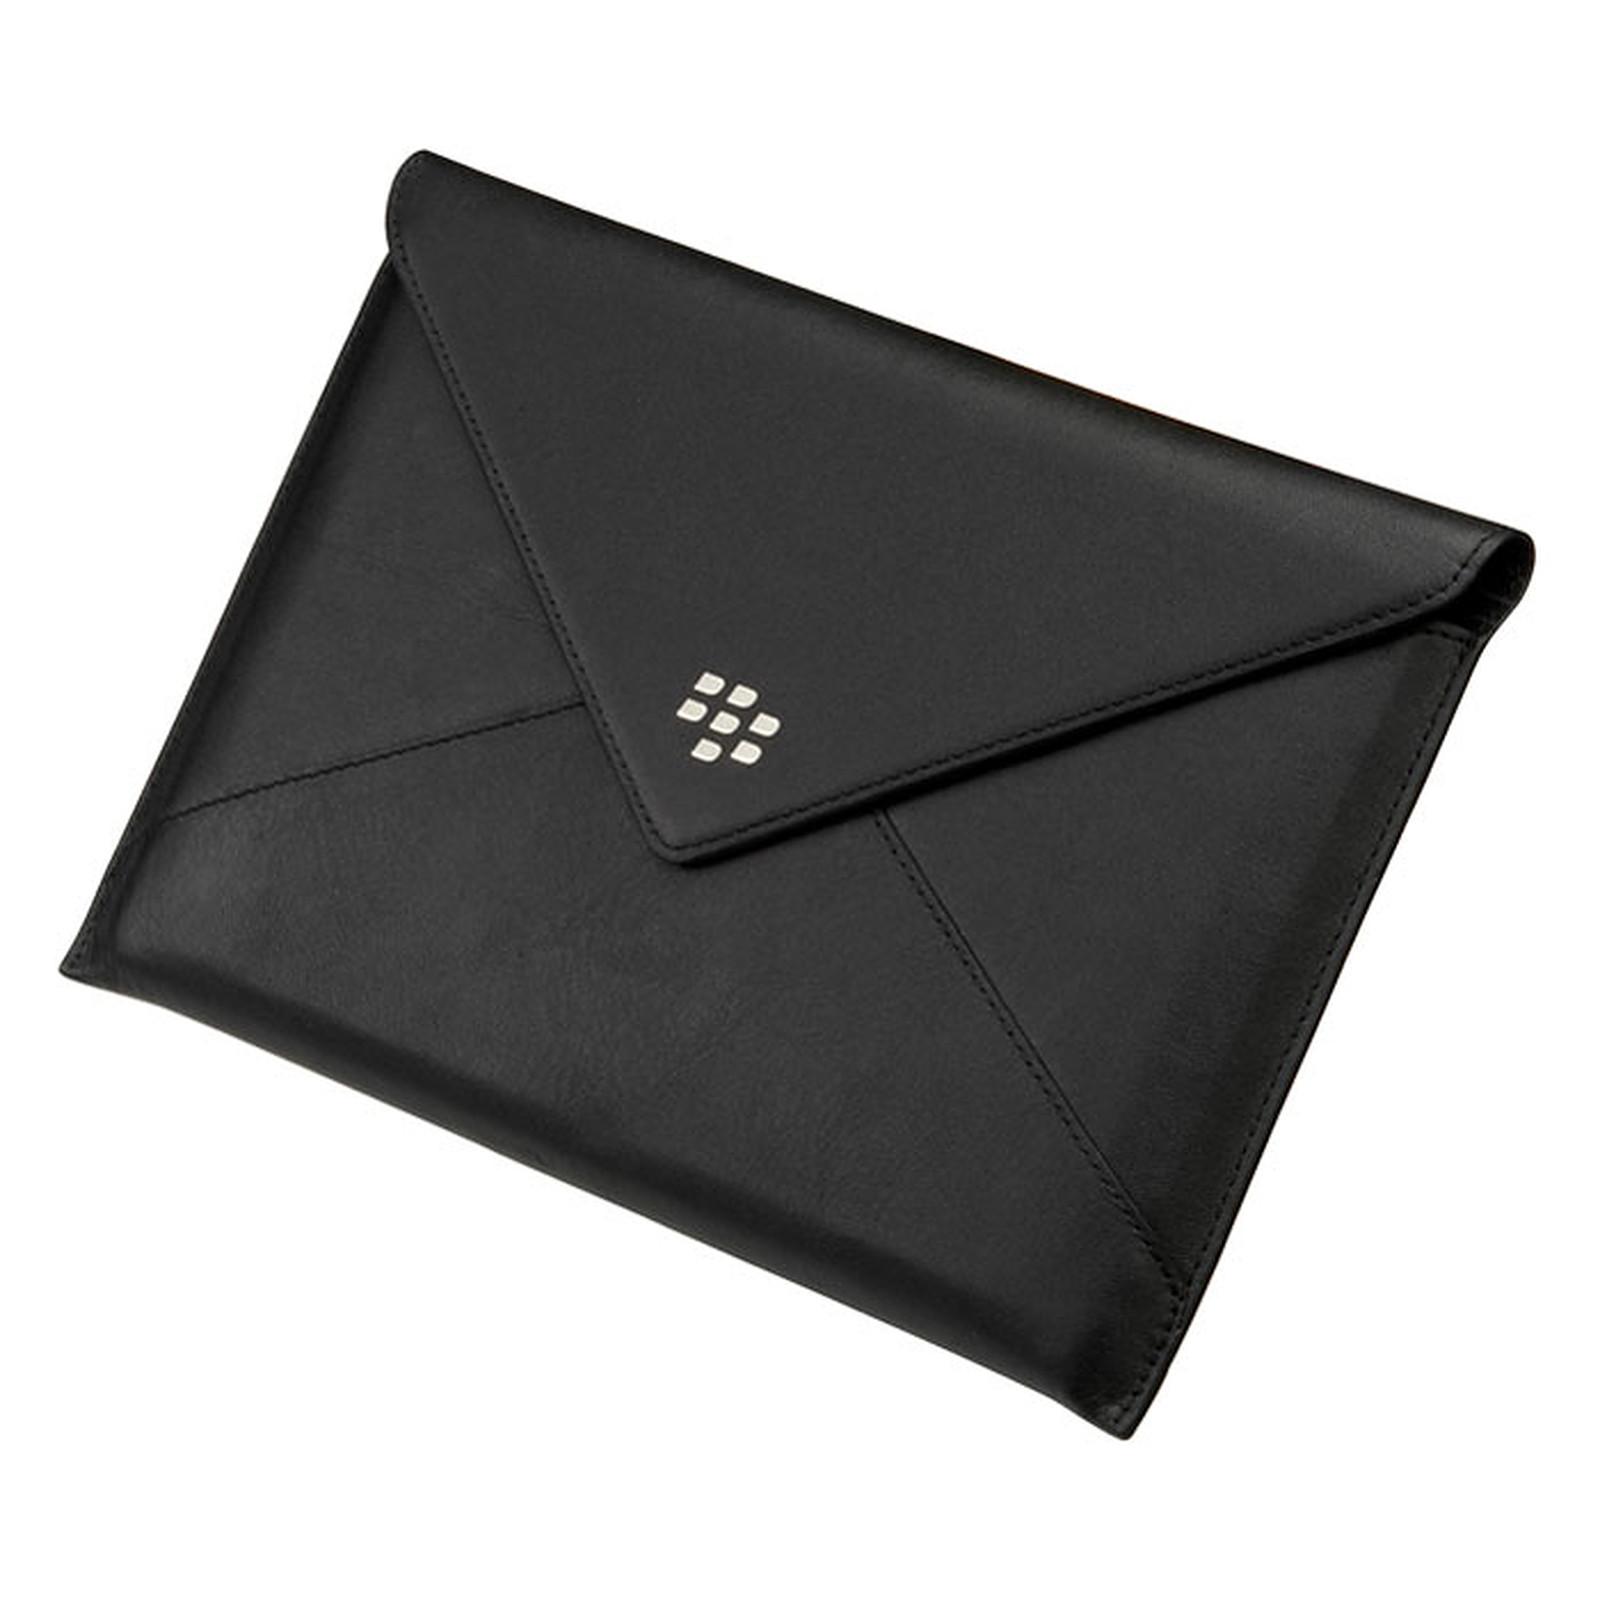 BlackBerry PlayBook Leather Envelope Noir